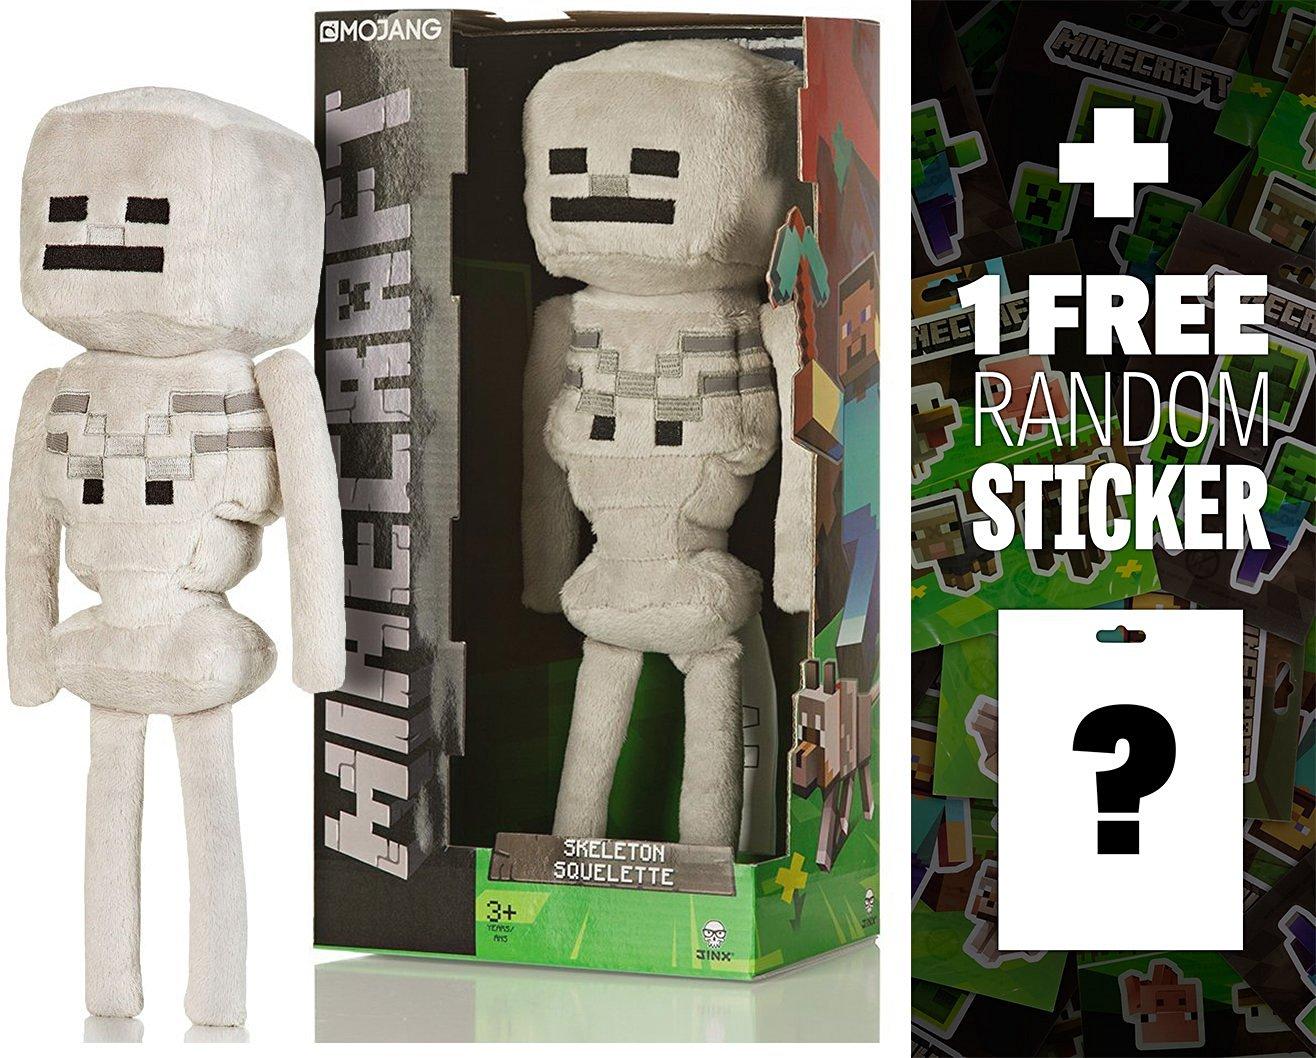 "Skeleton Squelette: ~12"" (~9"" Sitting) Jinx Minecraft Plush Series + 1 FREE Official Minecraft Mini-Sticker Sheet Bundle"